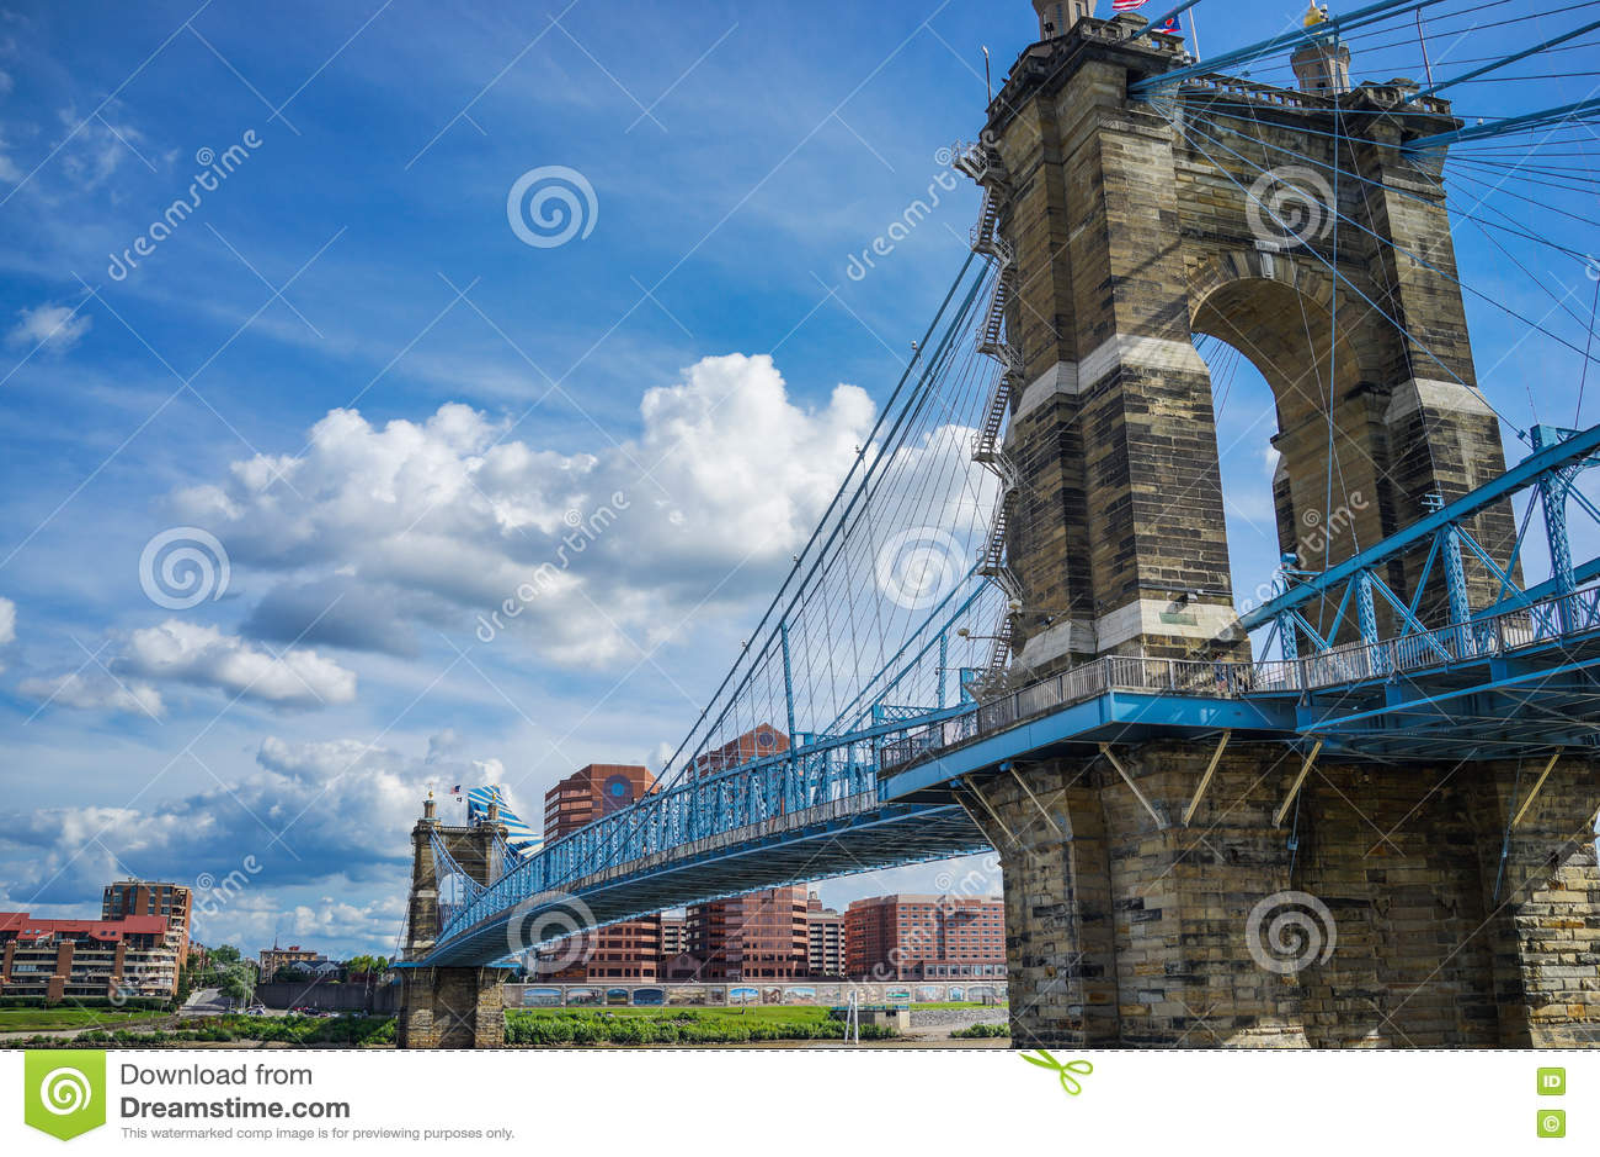 Cincinnati na most John Ohio roebling zawieszenie Roebling zawieszenia most, Cincinnati, Ohio